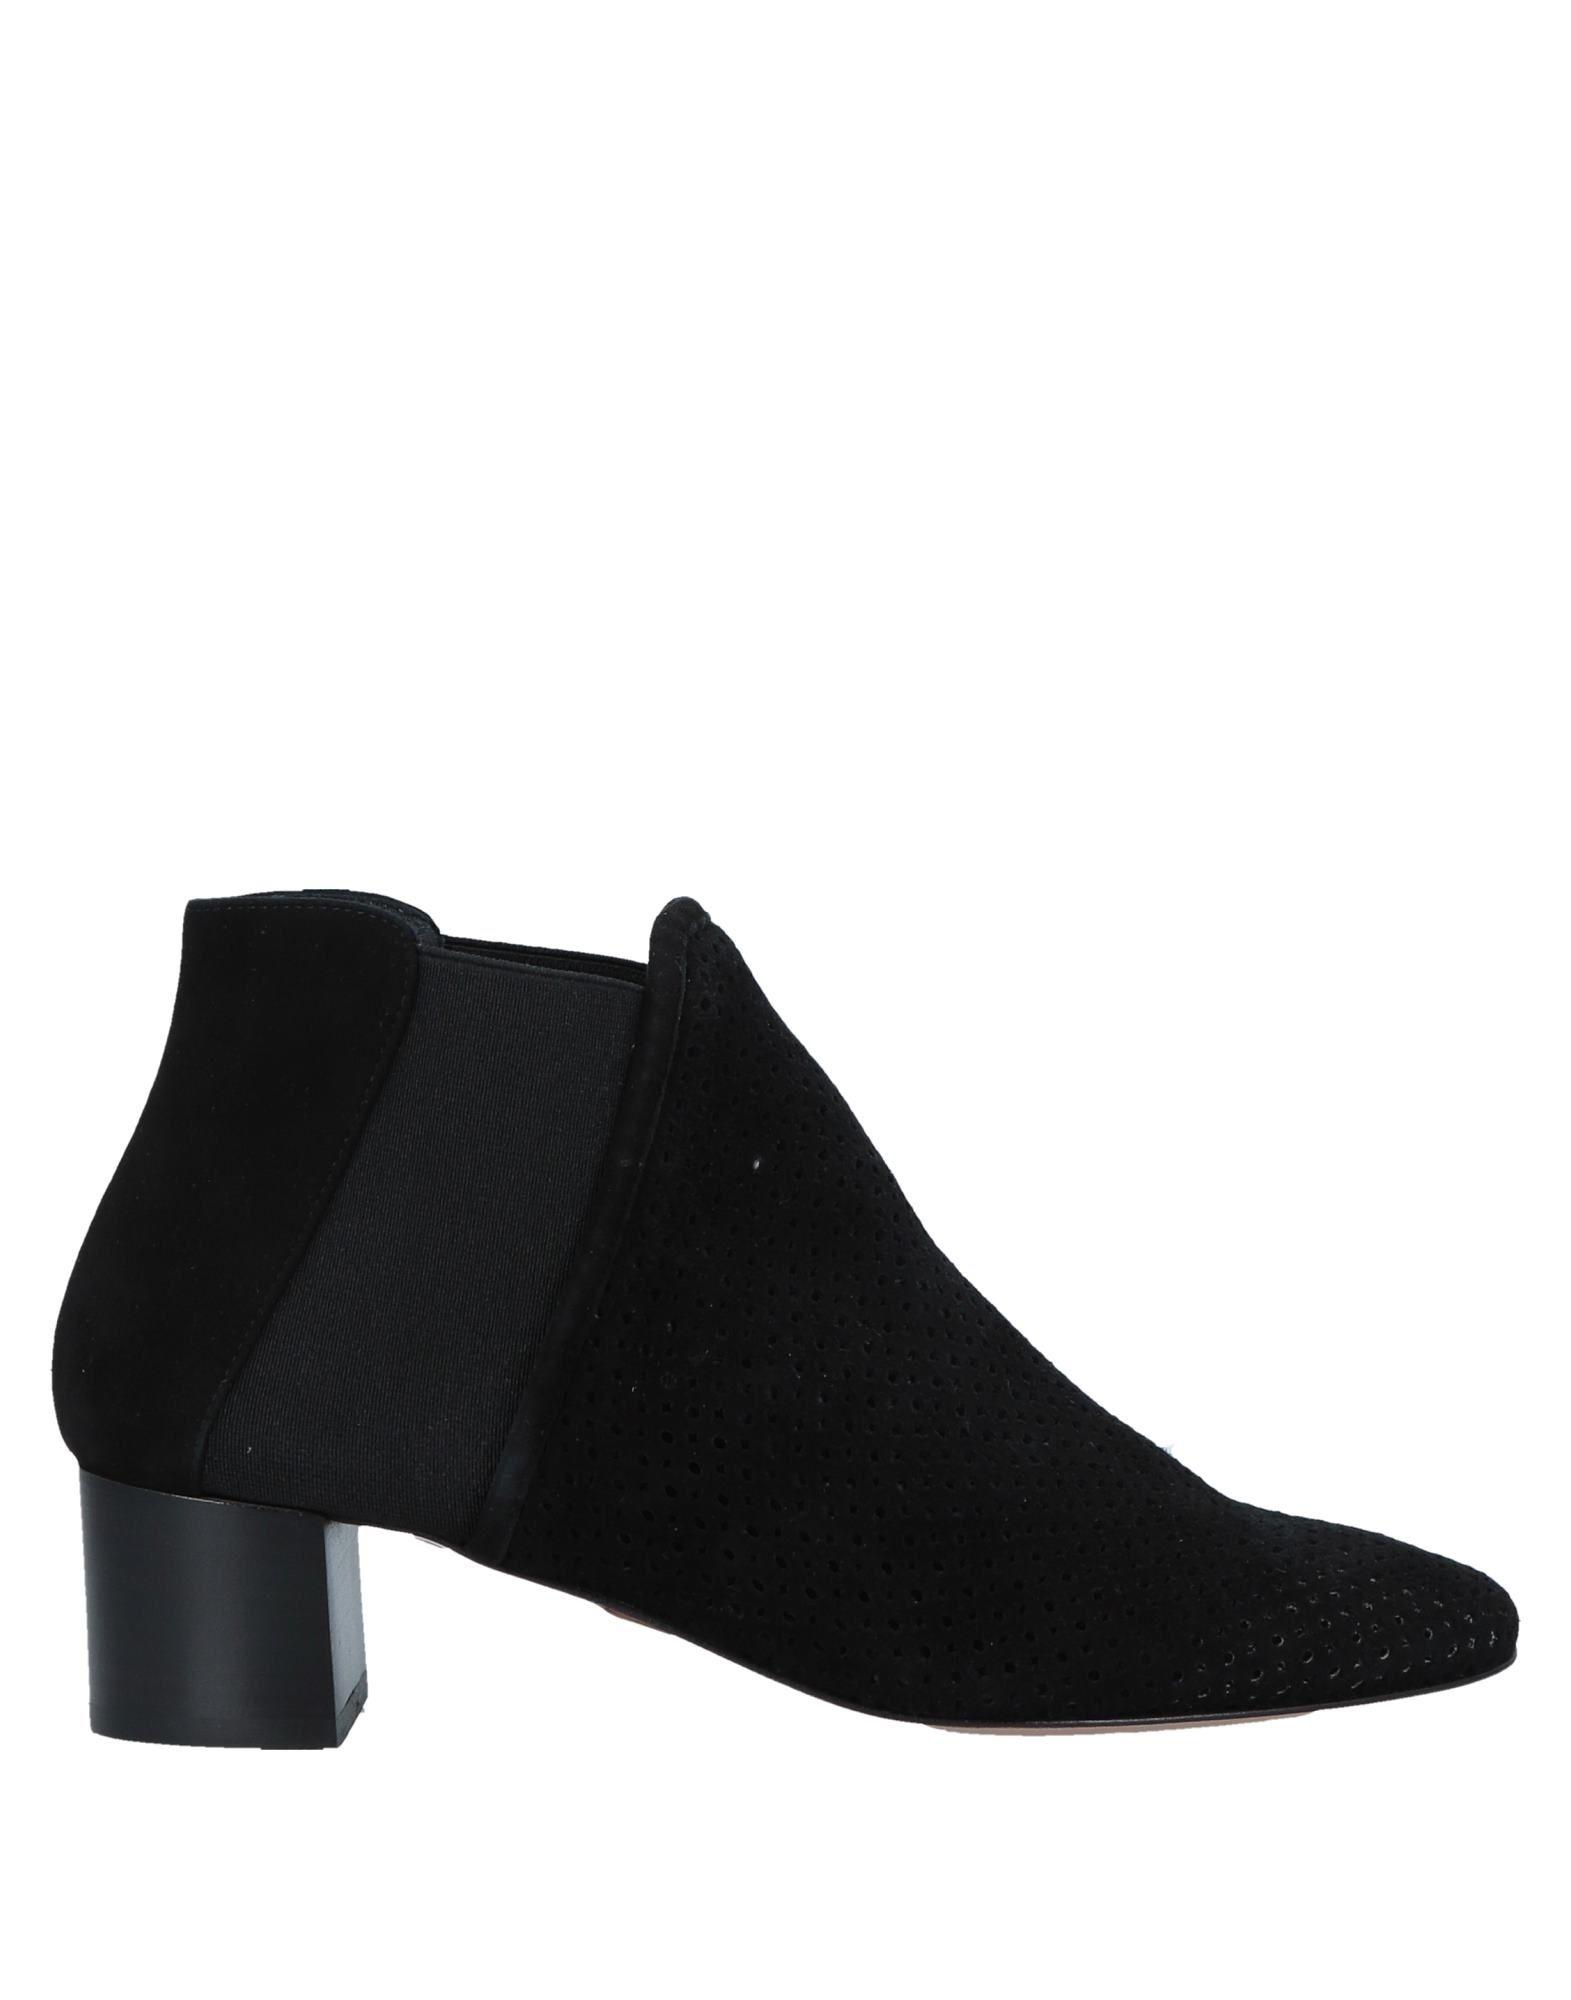 LA CORTE DELLA PELLE by FRANCO BALLIN Полусапоги и высокие ботинки радиотелефон alcatel origin black